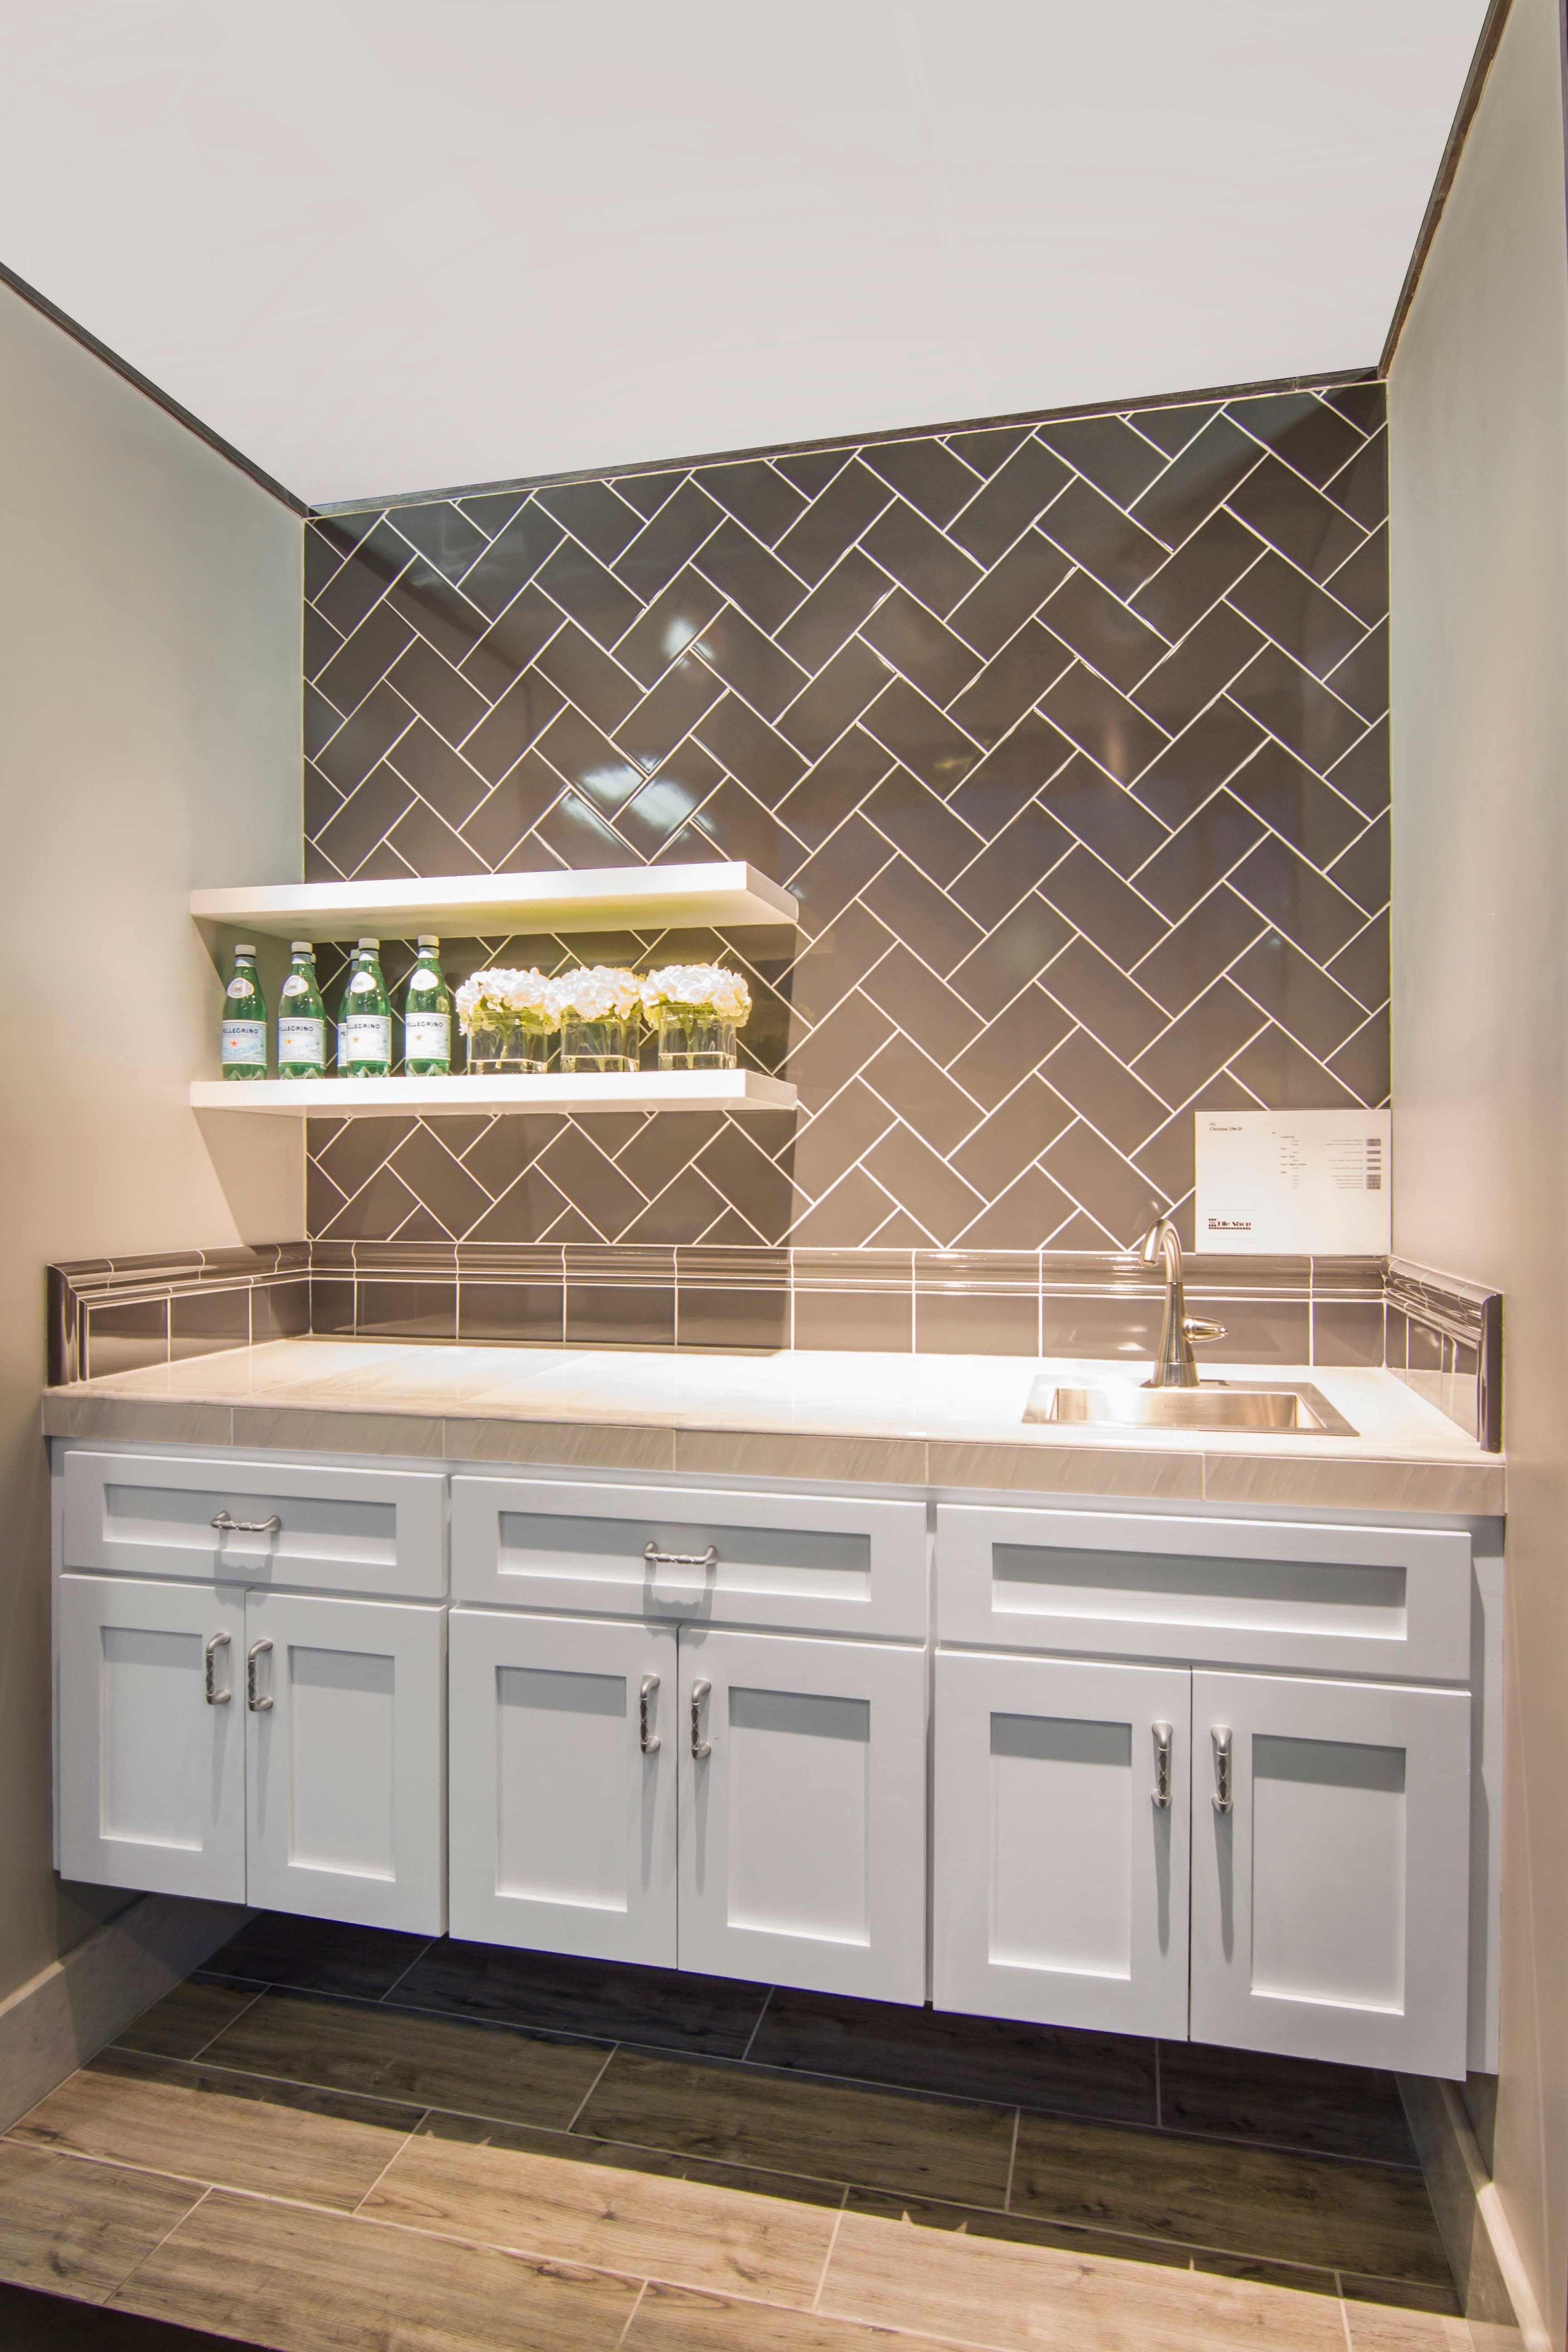 Home Bar Designs Counter Backsplash Tile Imperial Pewter Gloss